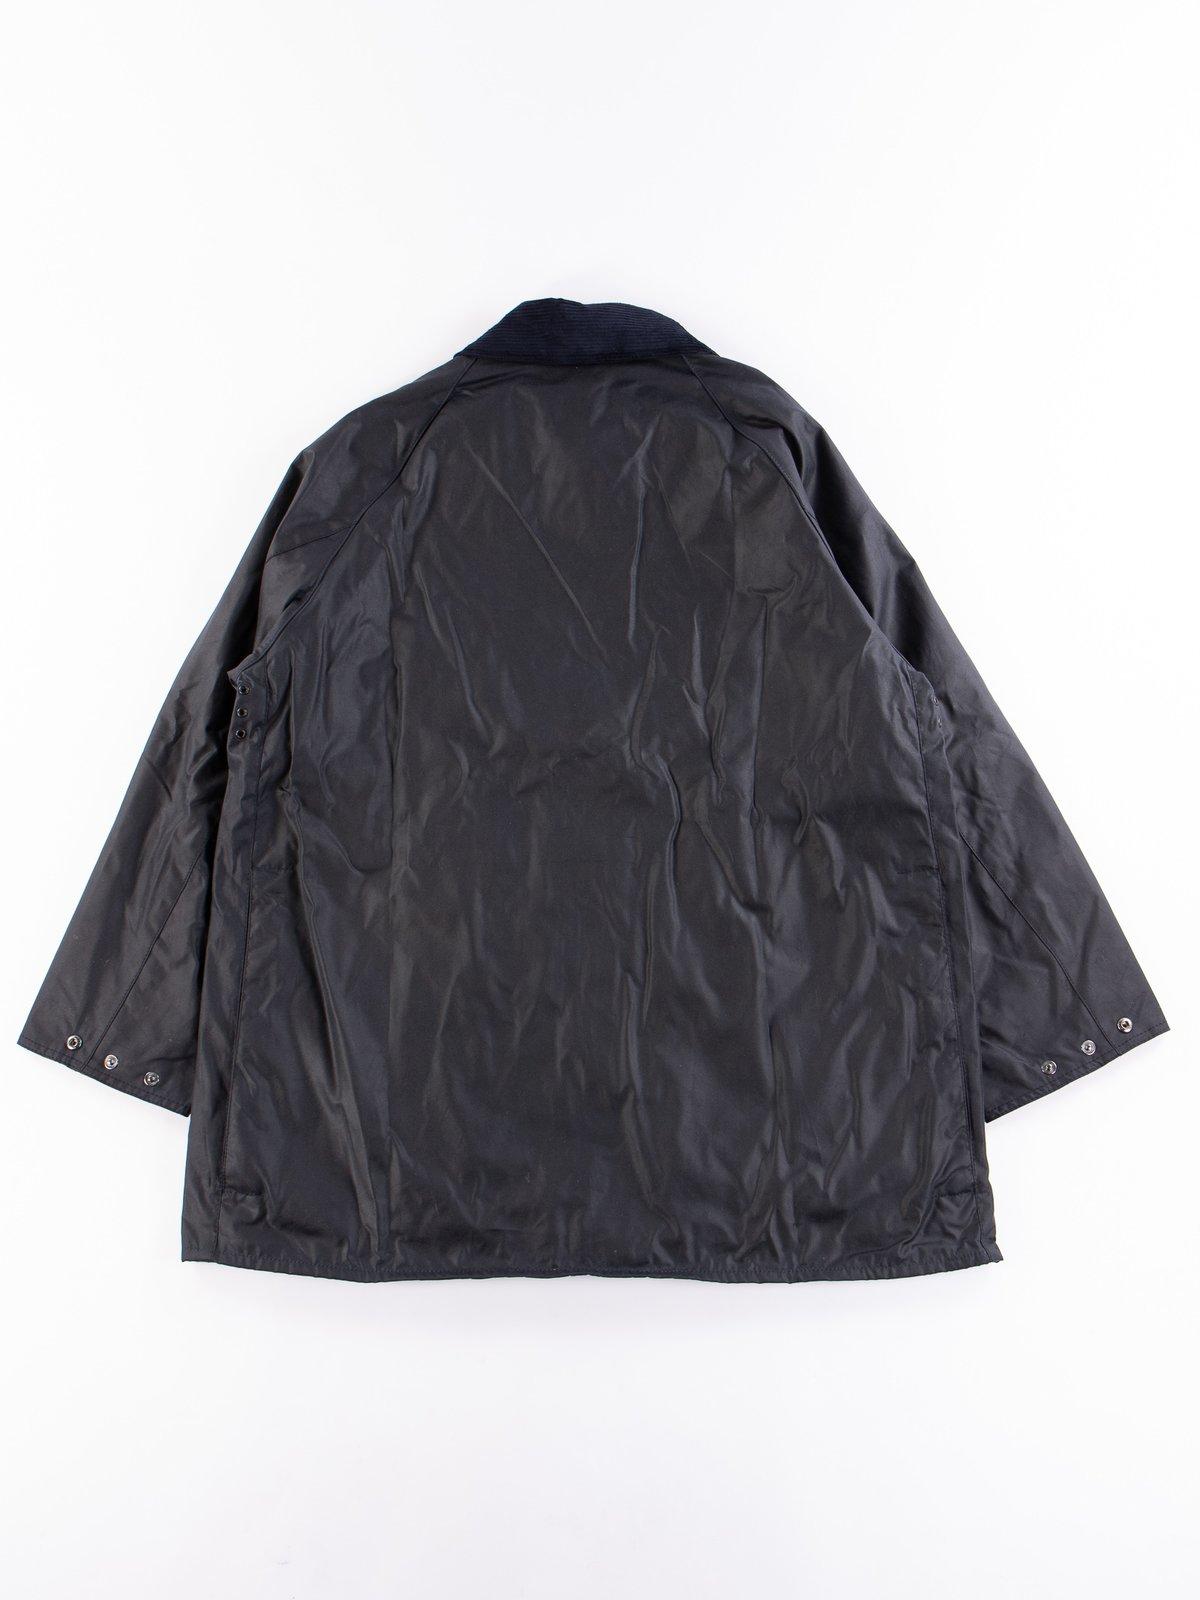 Navy Oversized Beaufort Waxed Cotton Jacket - Image 5